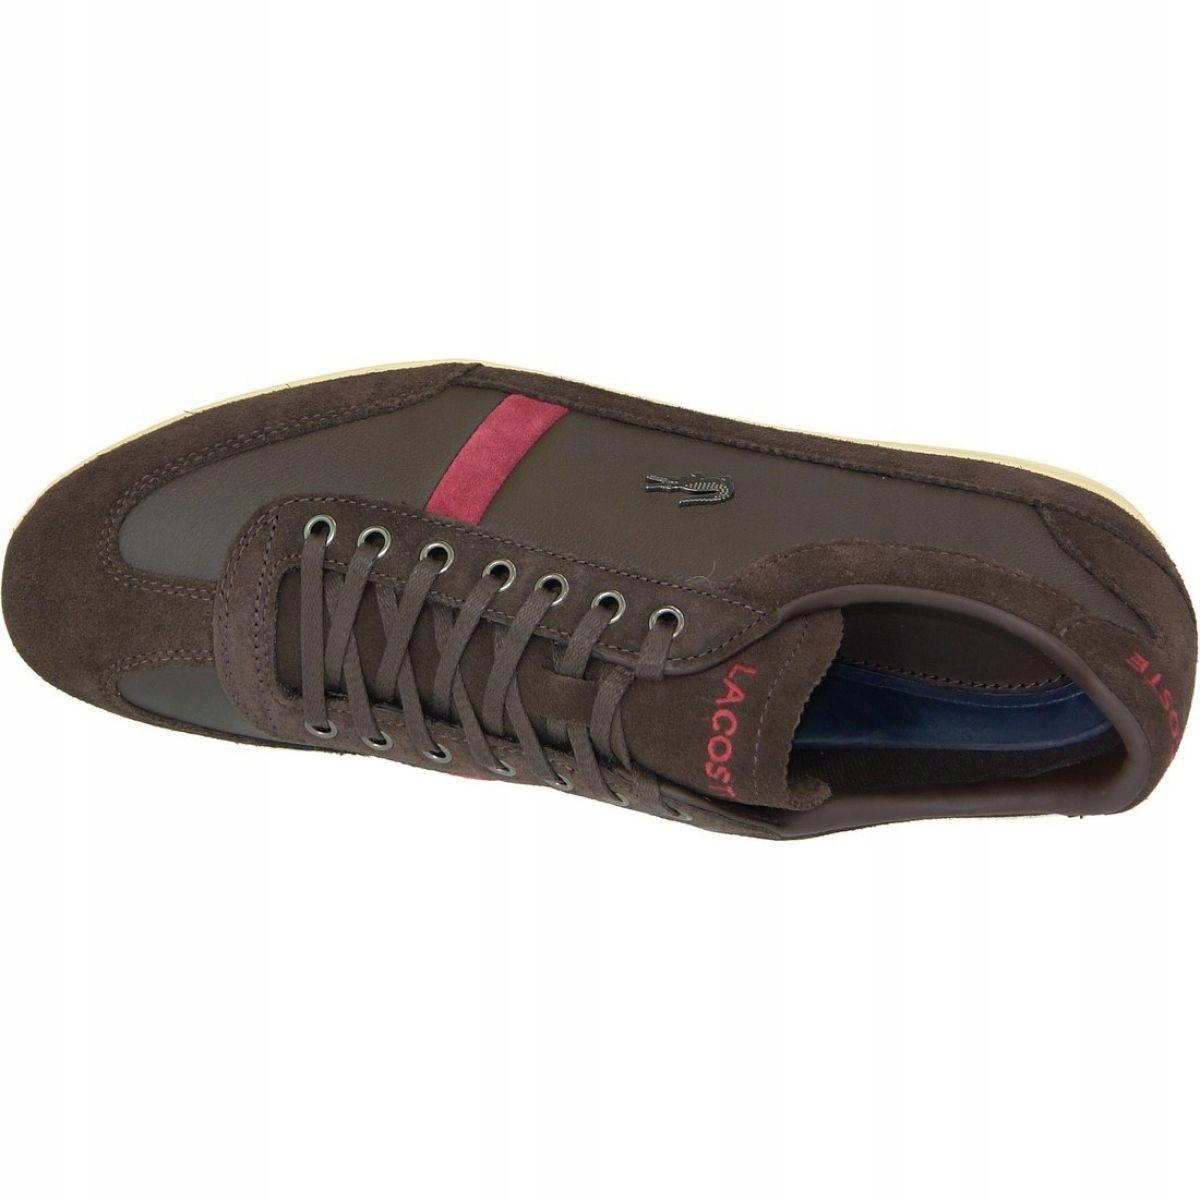 Lacoste-Misano-22-Lcr-M-SRM2146176-shoes-brown thumbnail 3